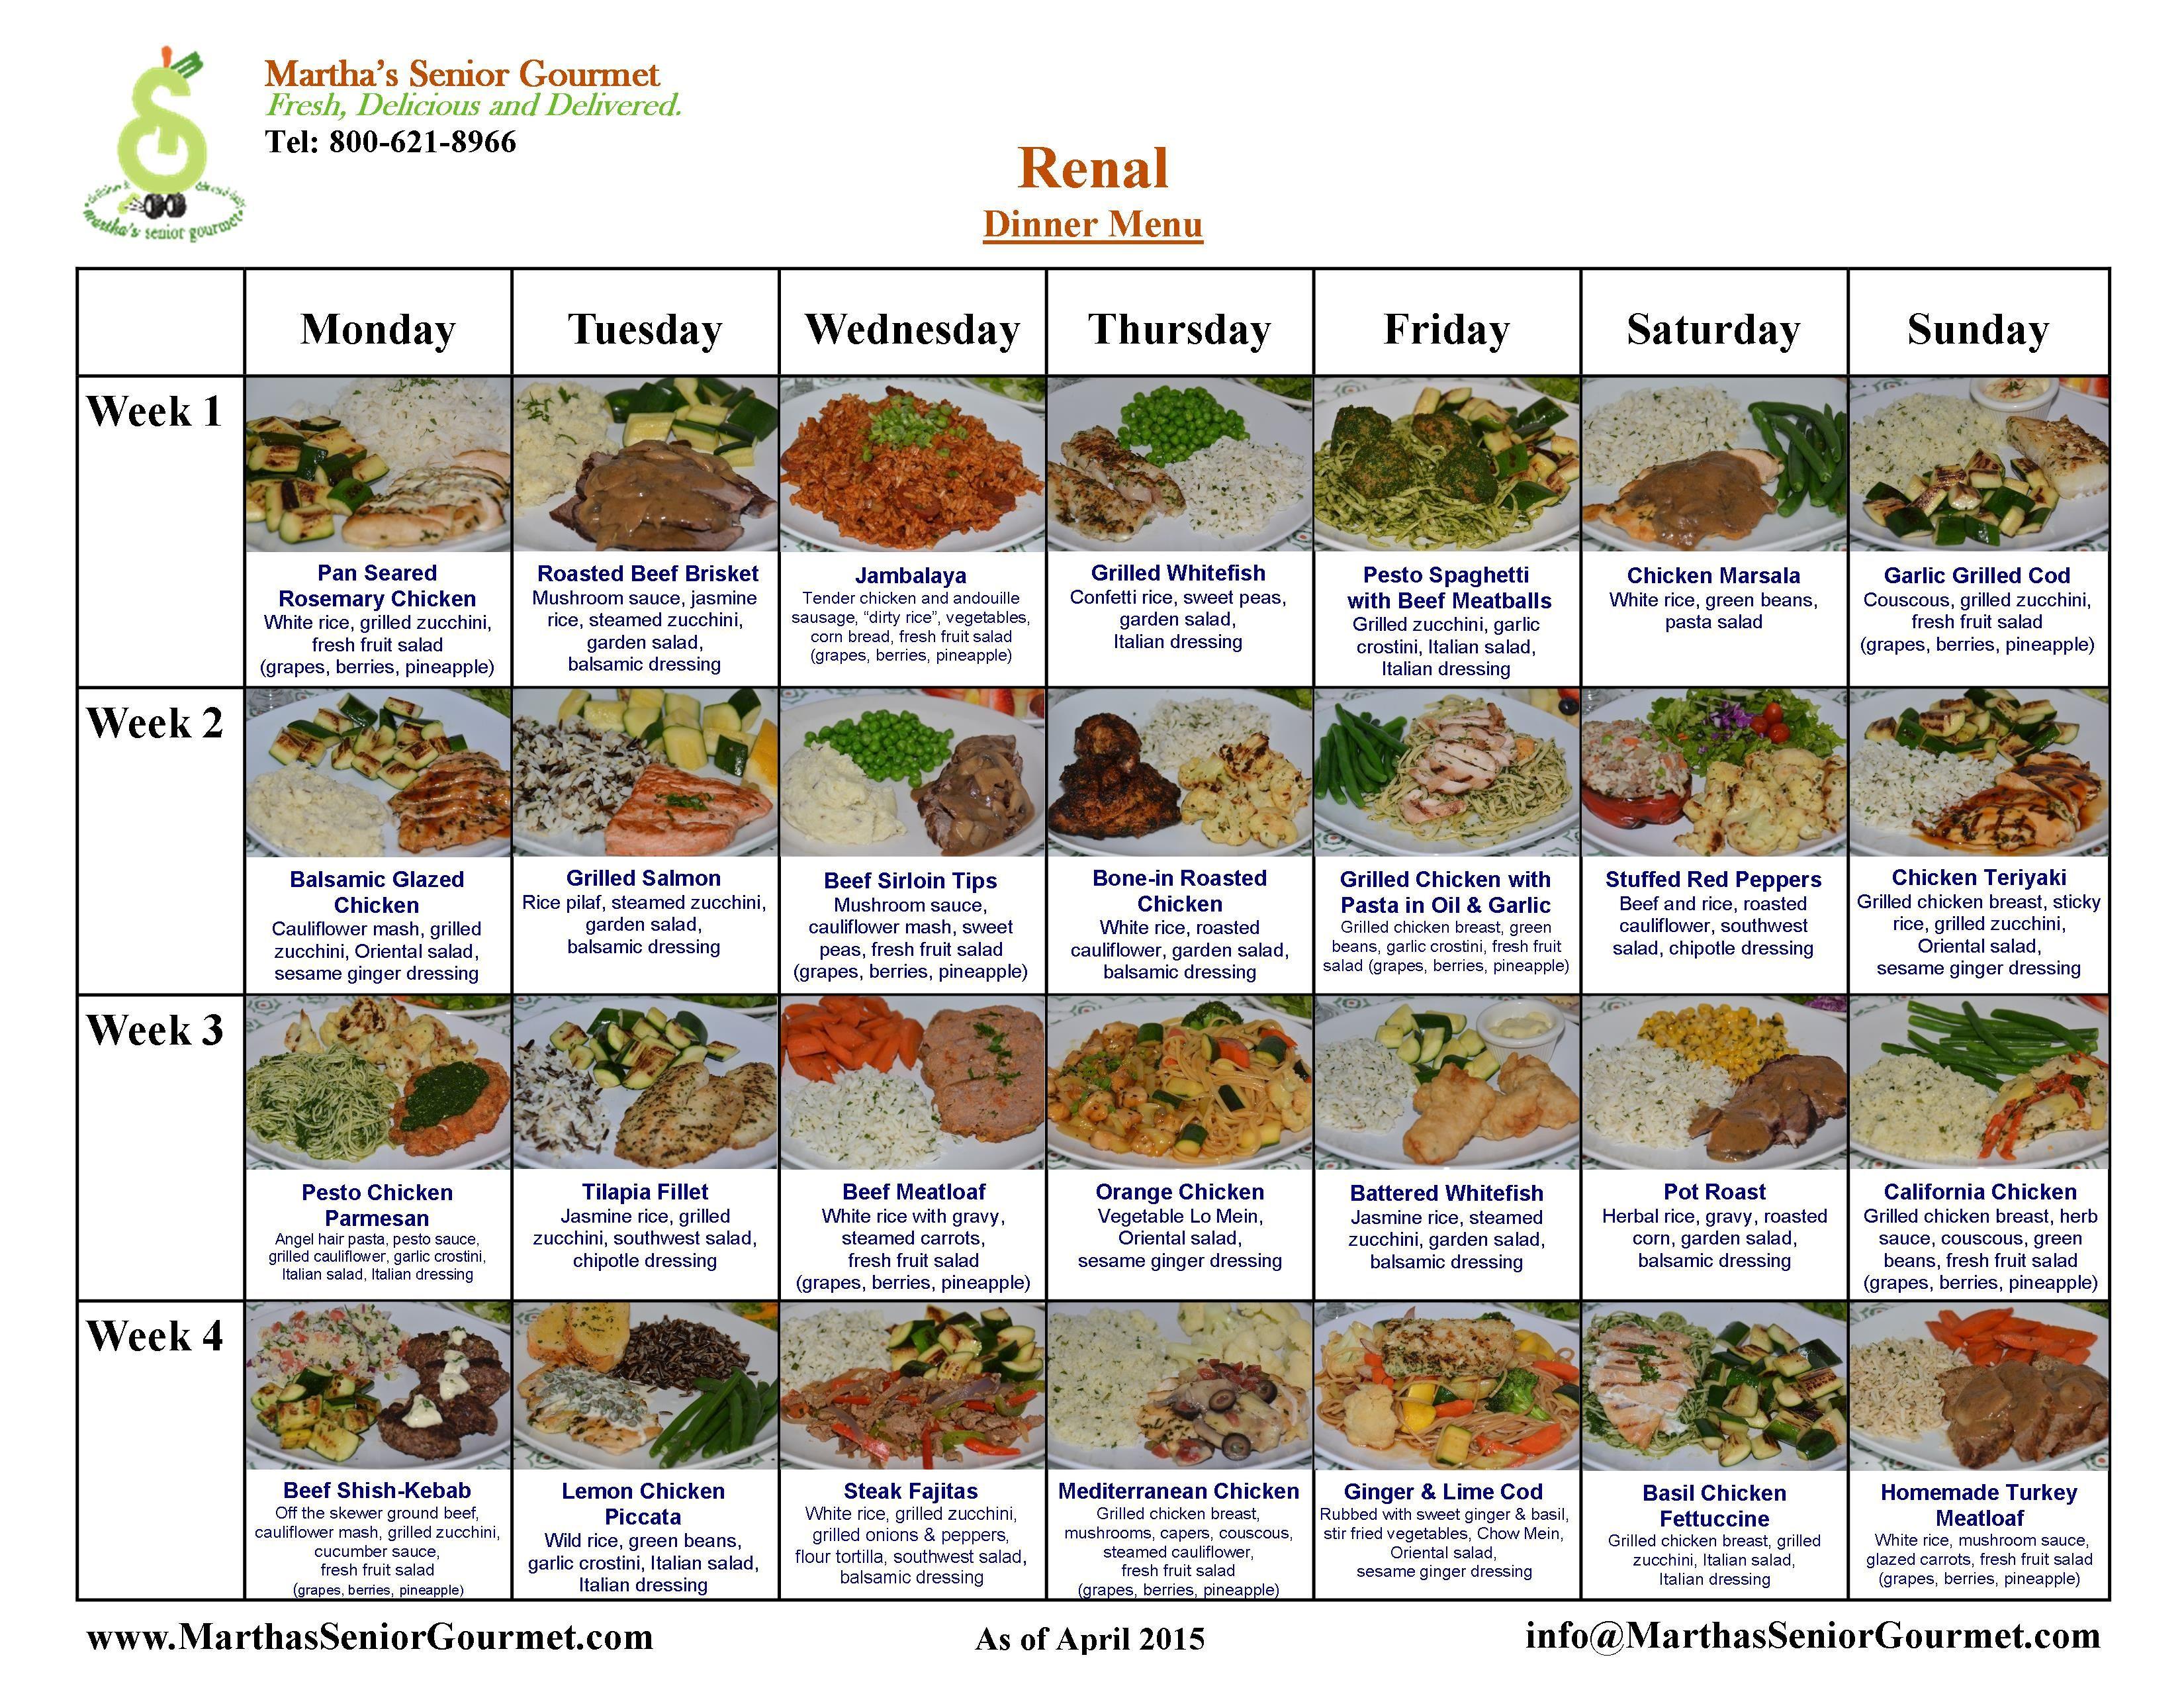 Diabetic Renal Diet Recipes  Renal Diet Menu